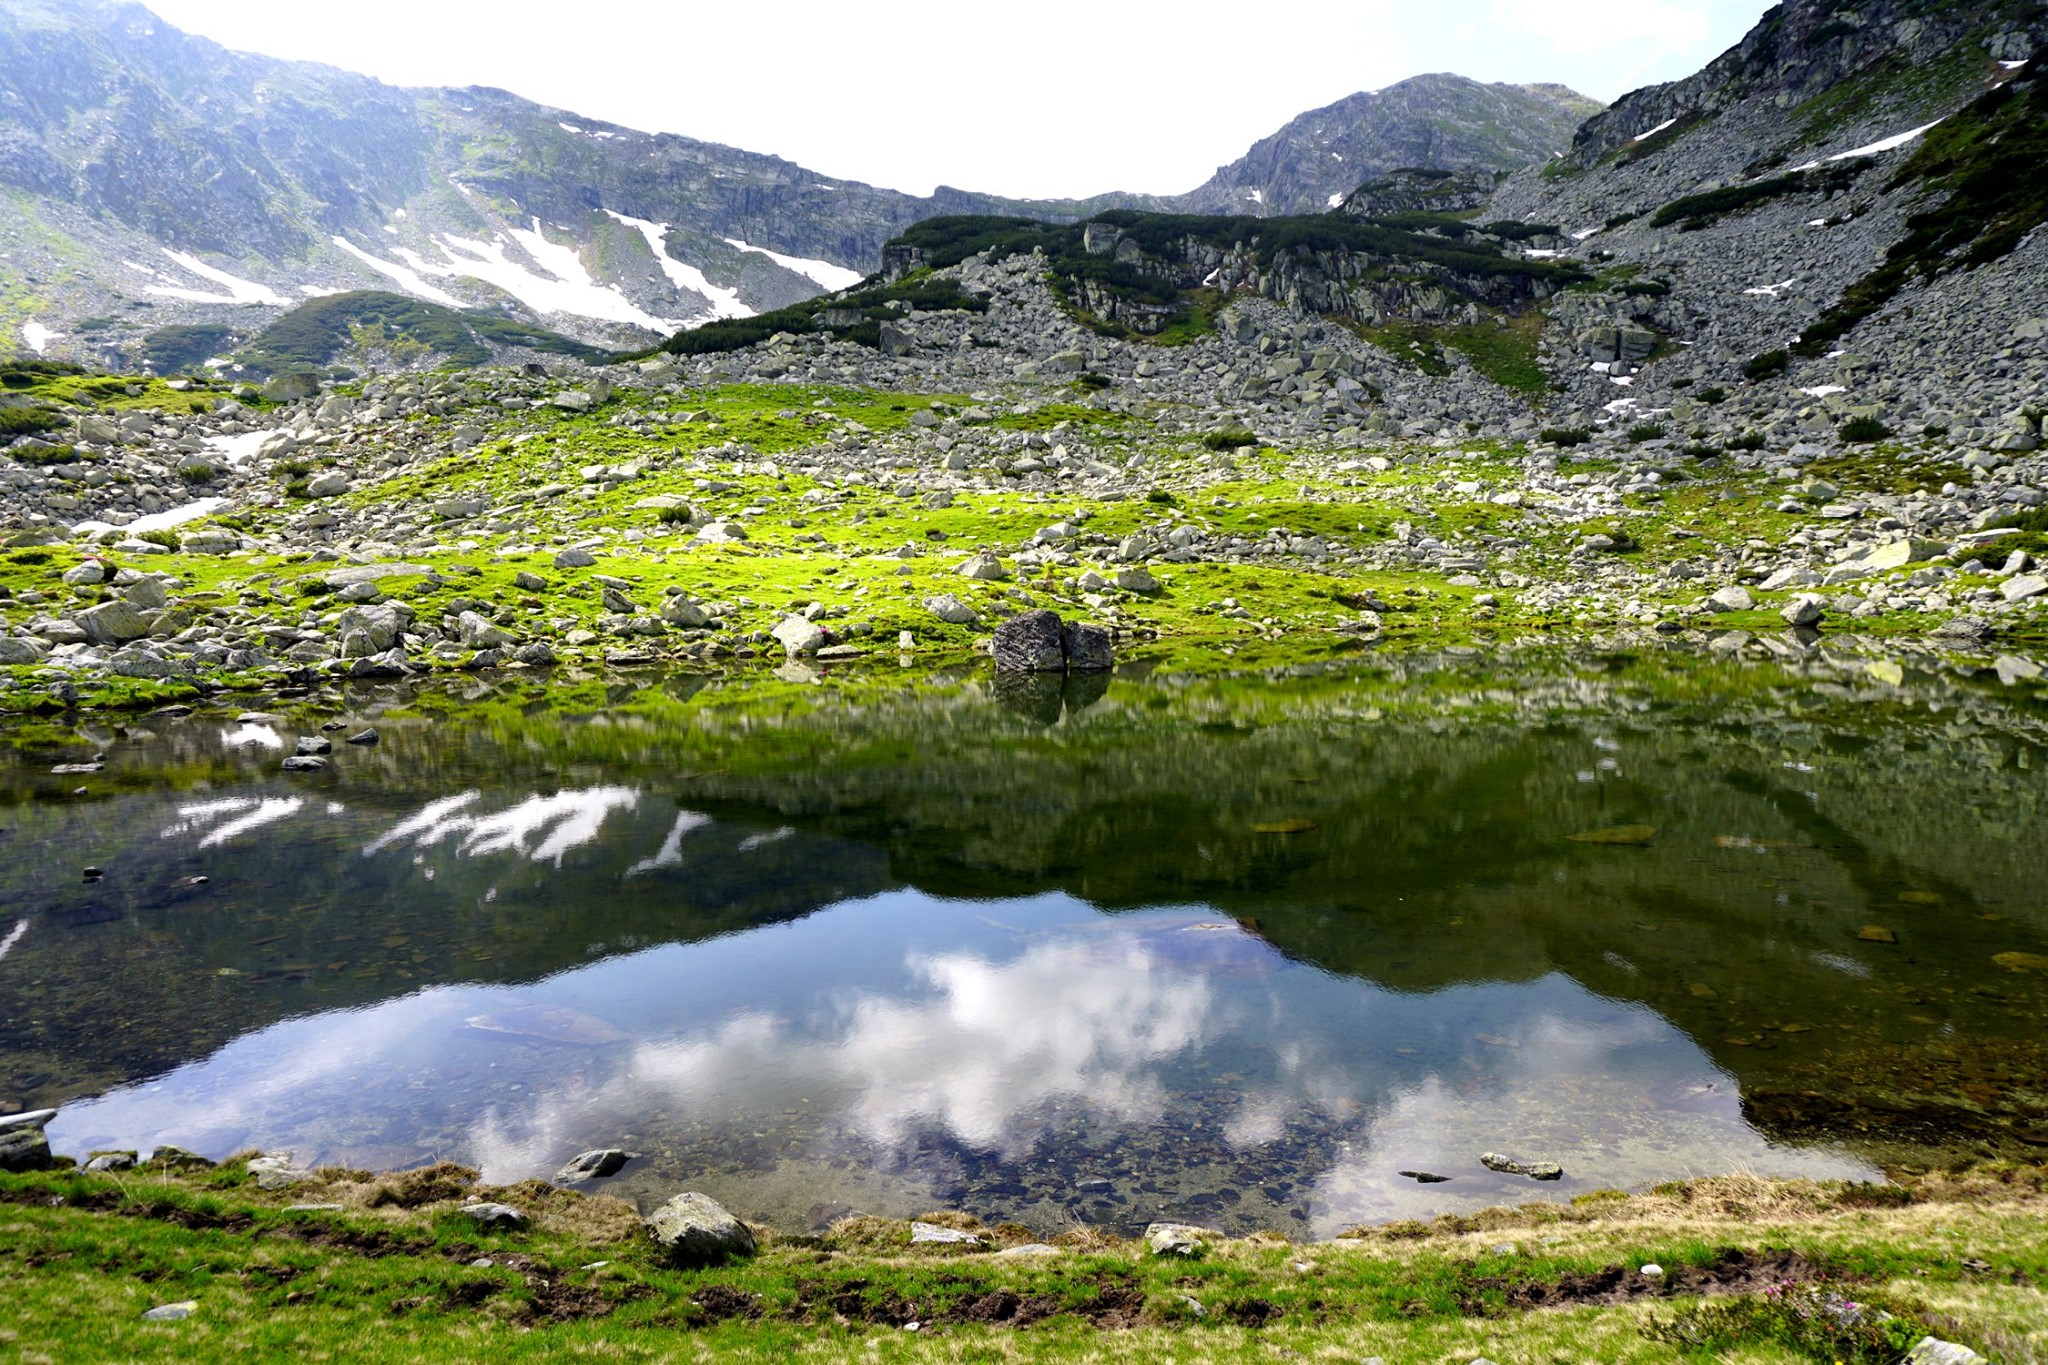 Lacul Zanoaga Stanei - Alexandra Pușcașu